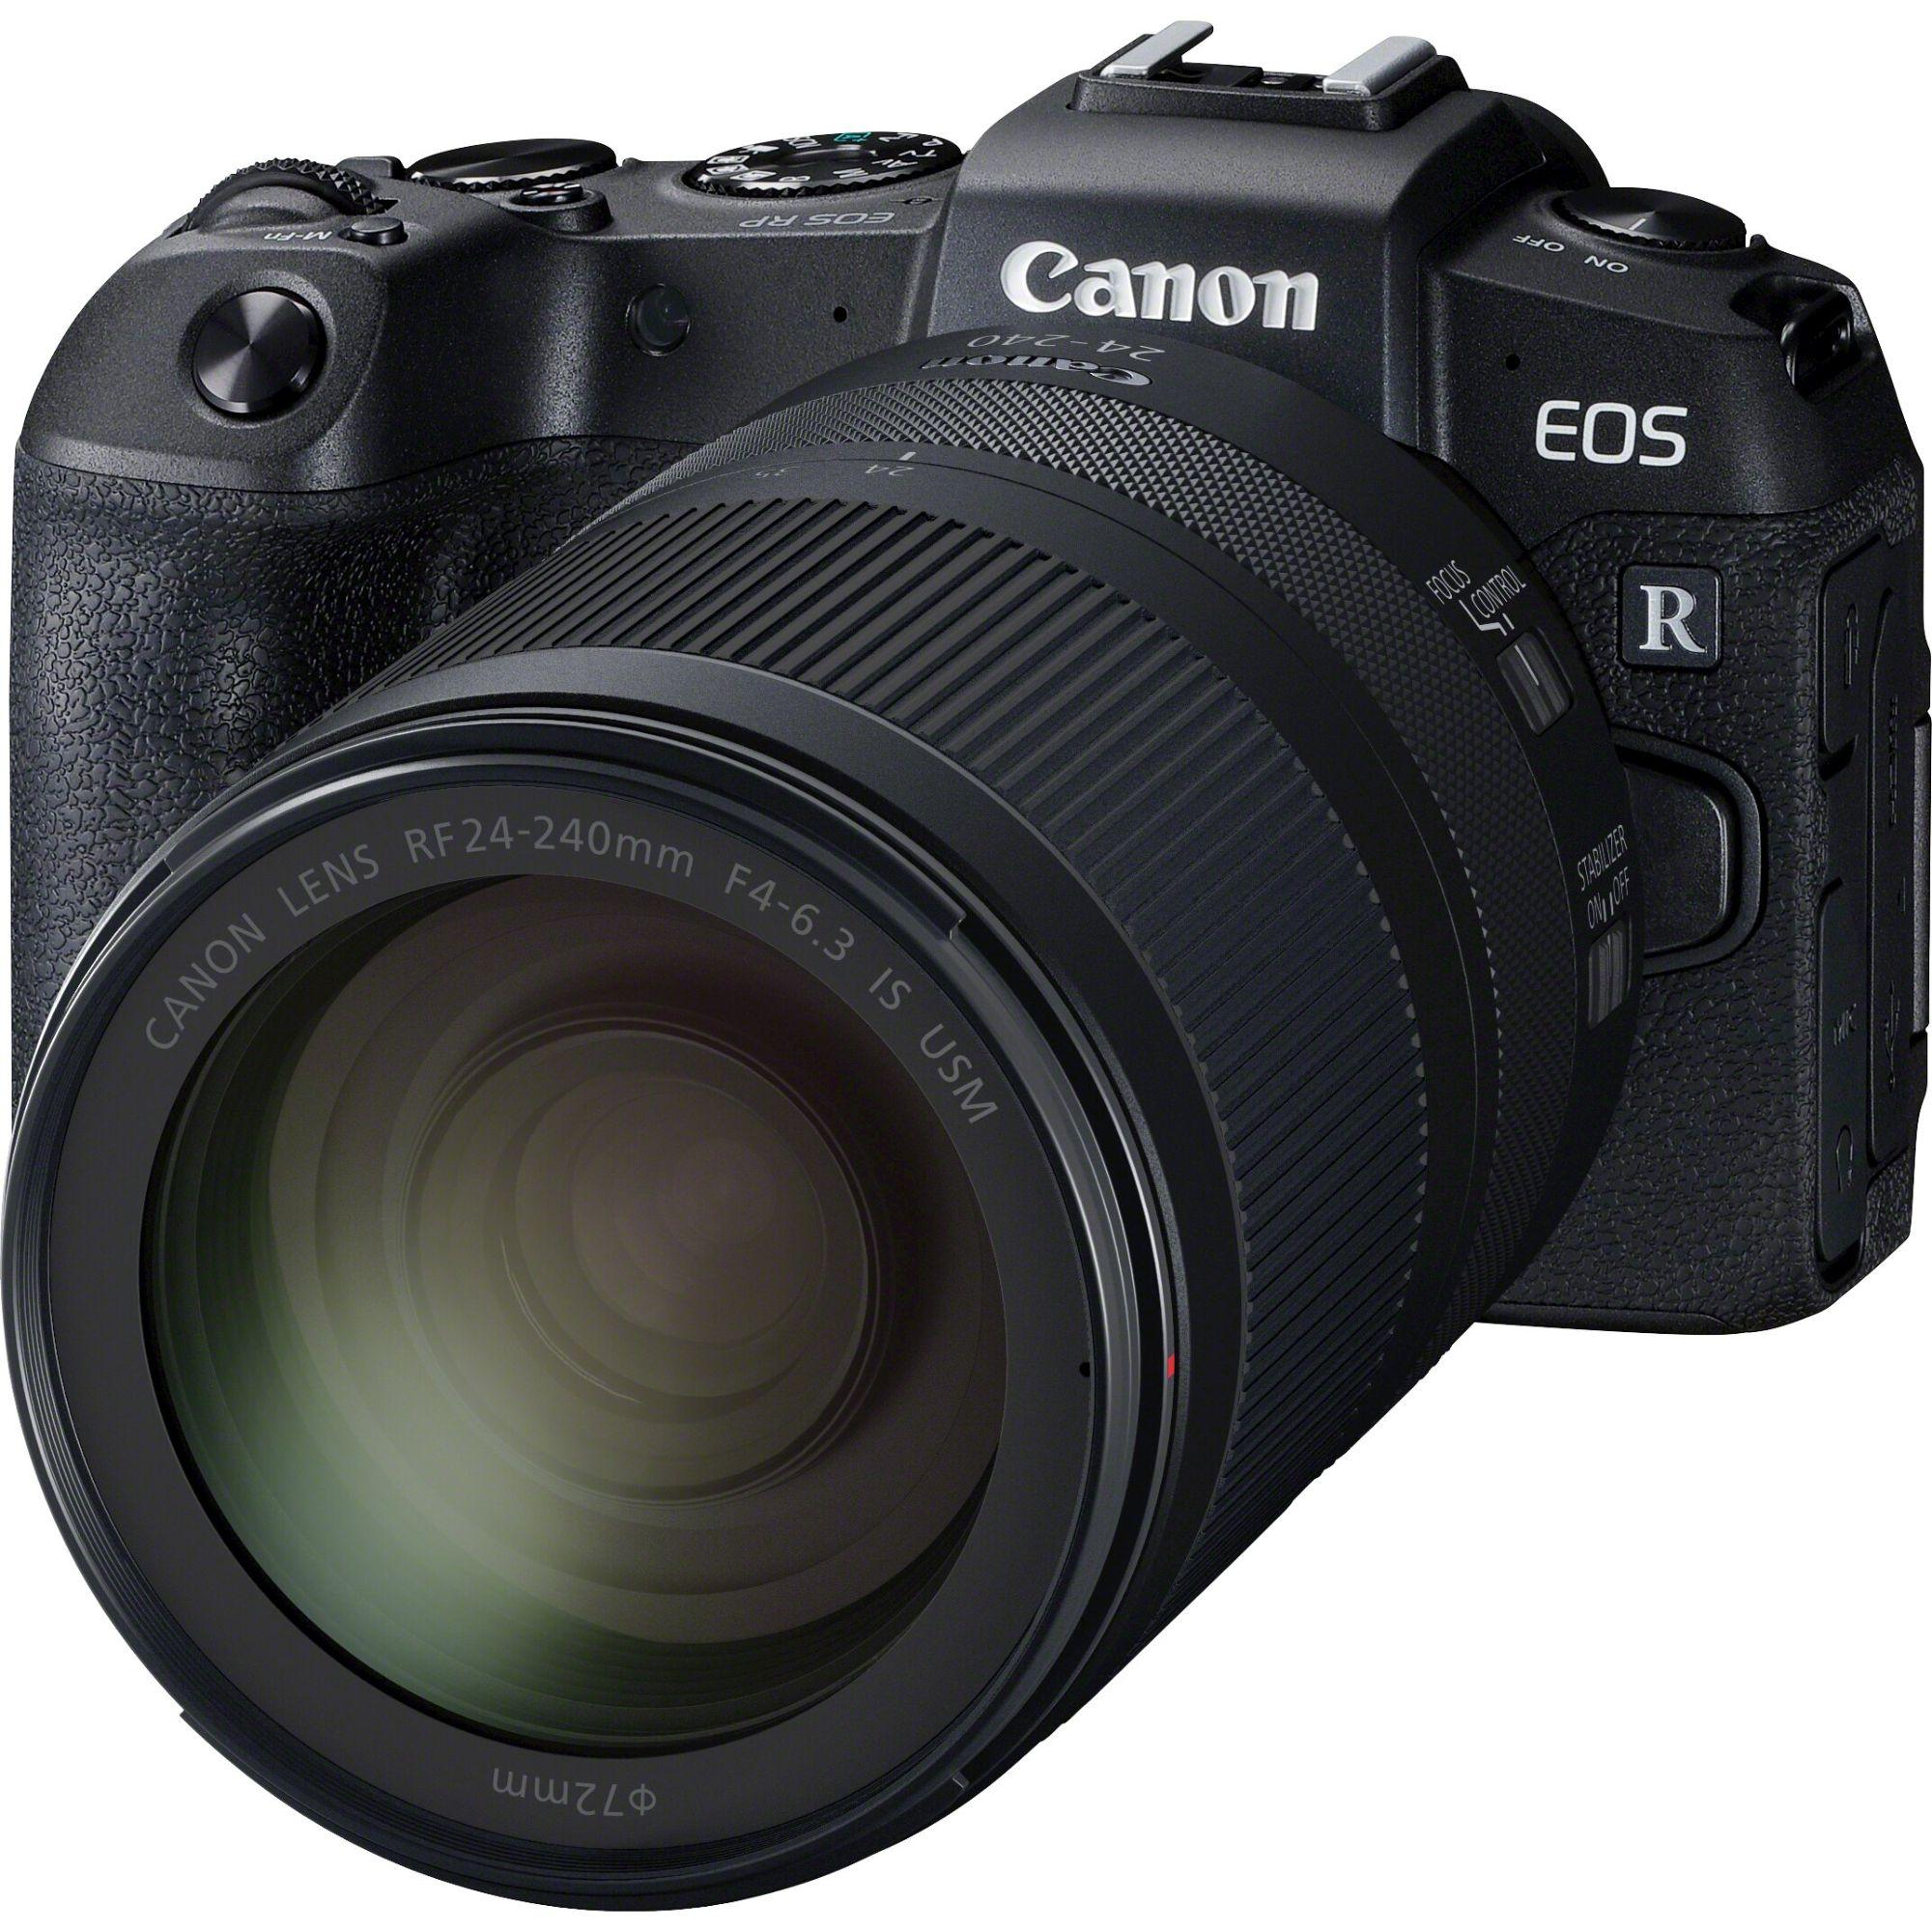 Appareil photo Reflex Canon EOS RP + Objectif RF 24-240 mm f/4-6.3 IS USM (+79.90€ en SuperPoints)